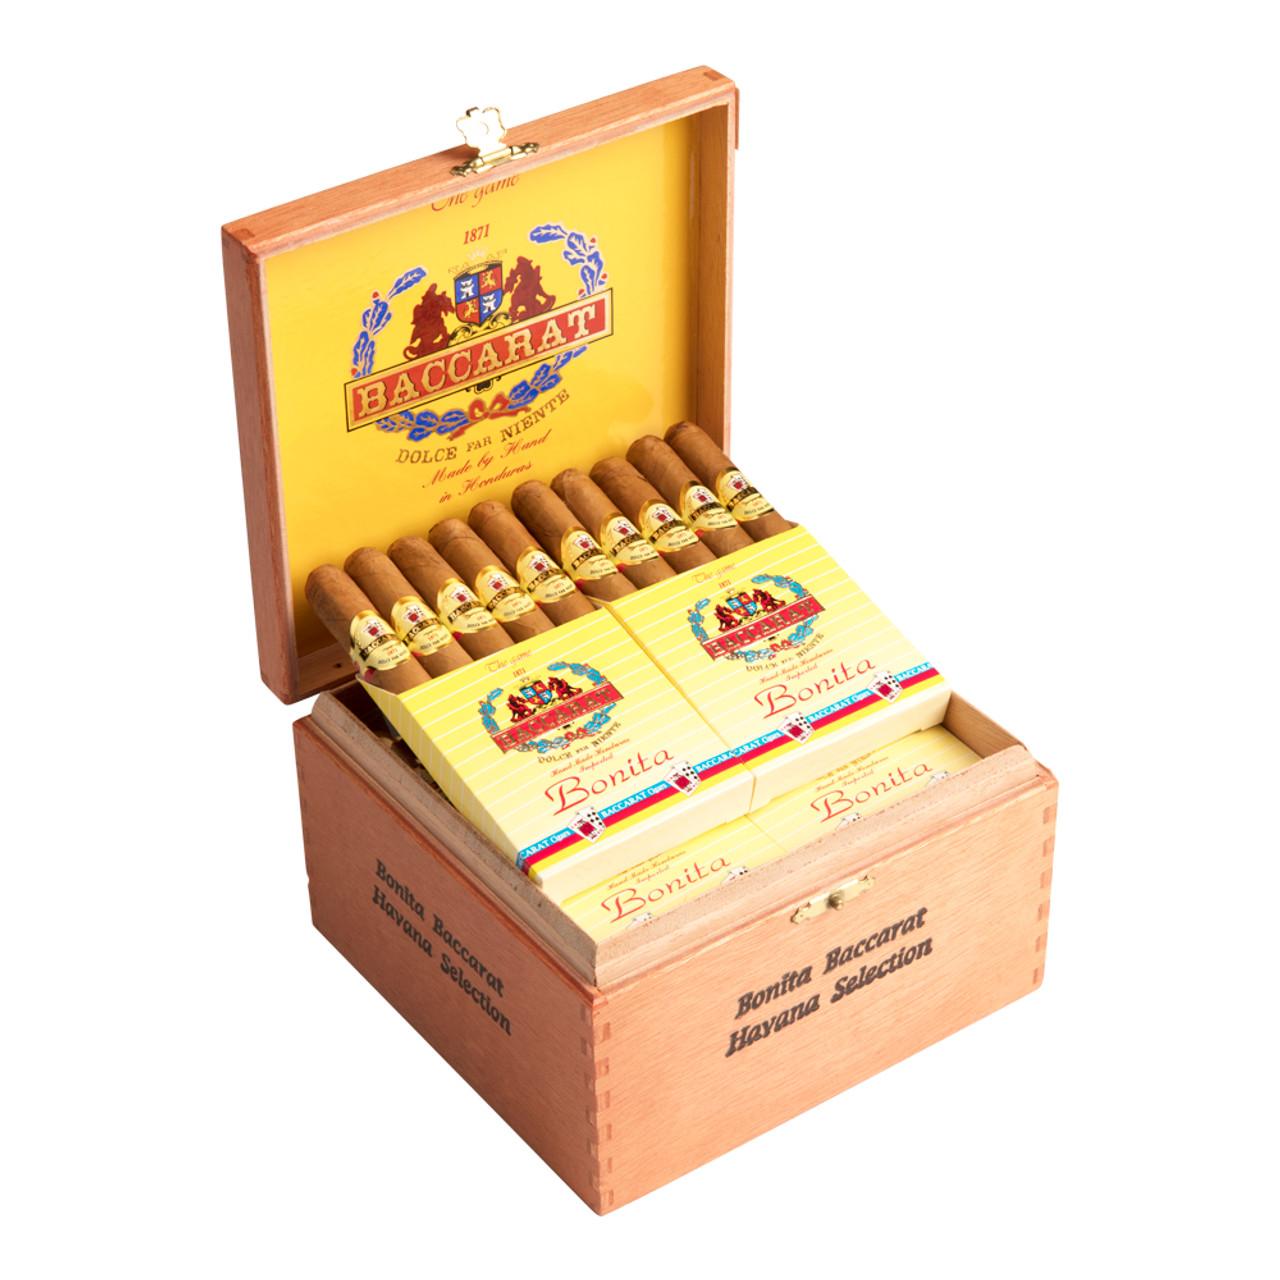 Baccarat Bonitas Cigars - 4.5 x 32 (Box of 60)